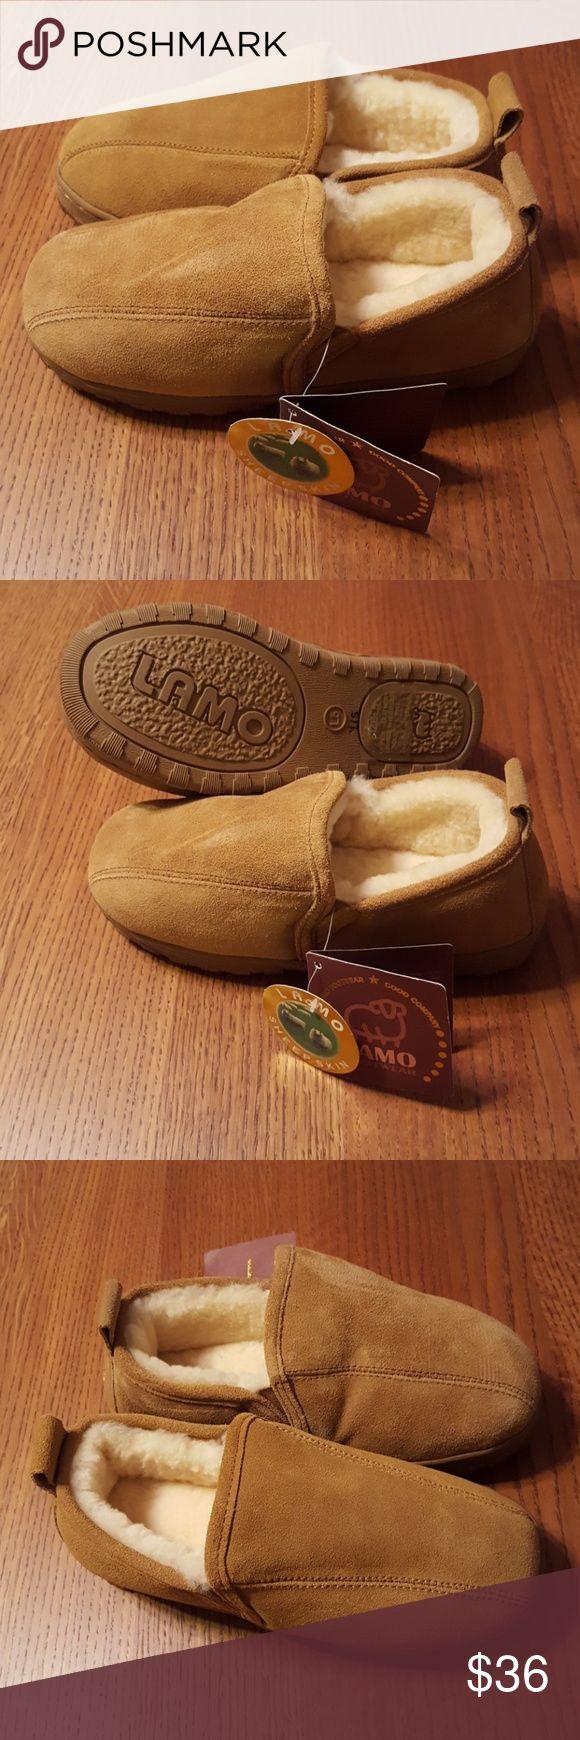 Lamo kids sheepskin slippers NWT Lamo 100% genuine sheepskin slippers for year round comfort. Lamo Shoes Slippers